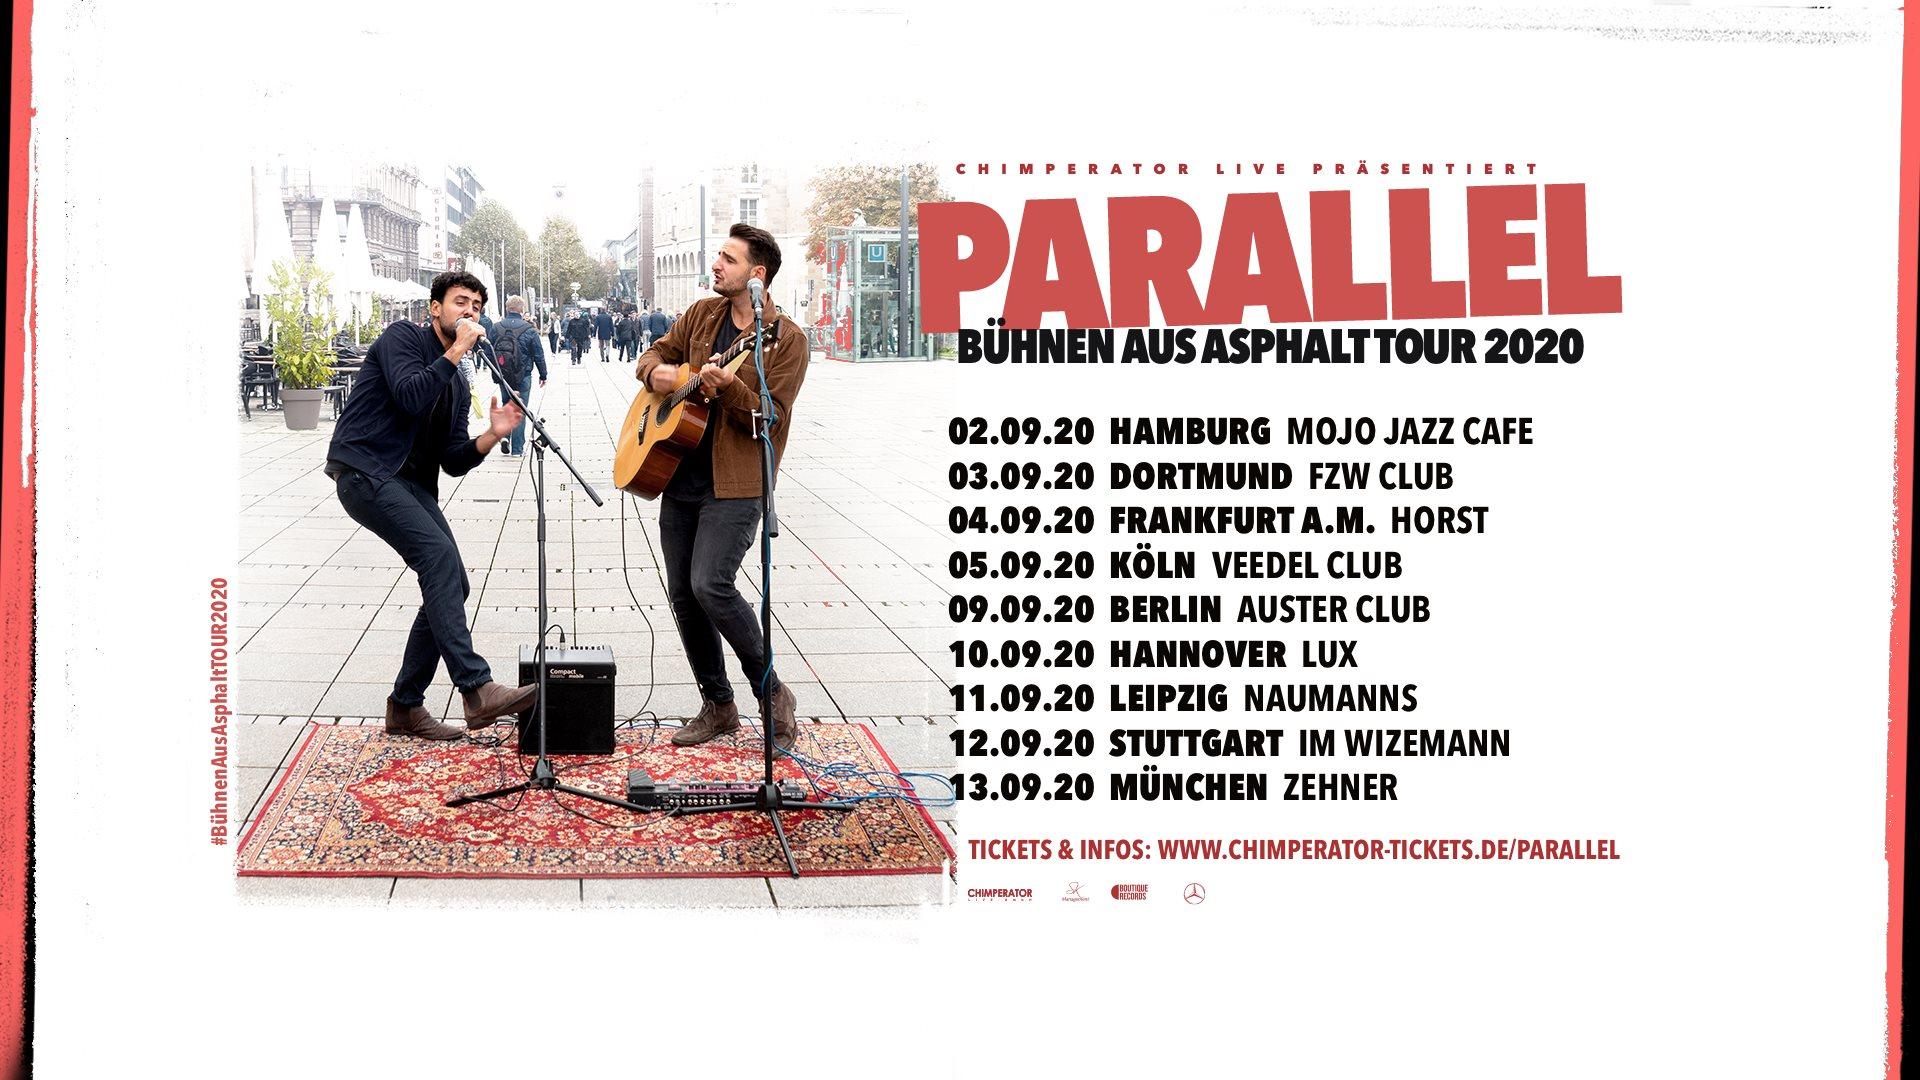 Parallel • Bühnen aus Asphalt Tour 2020